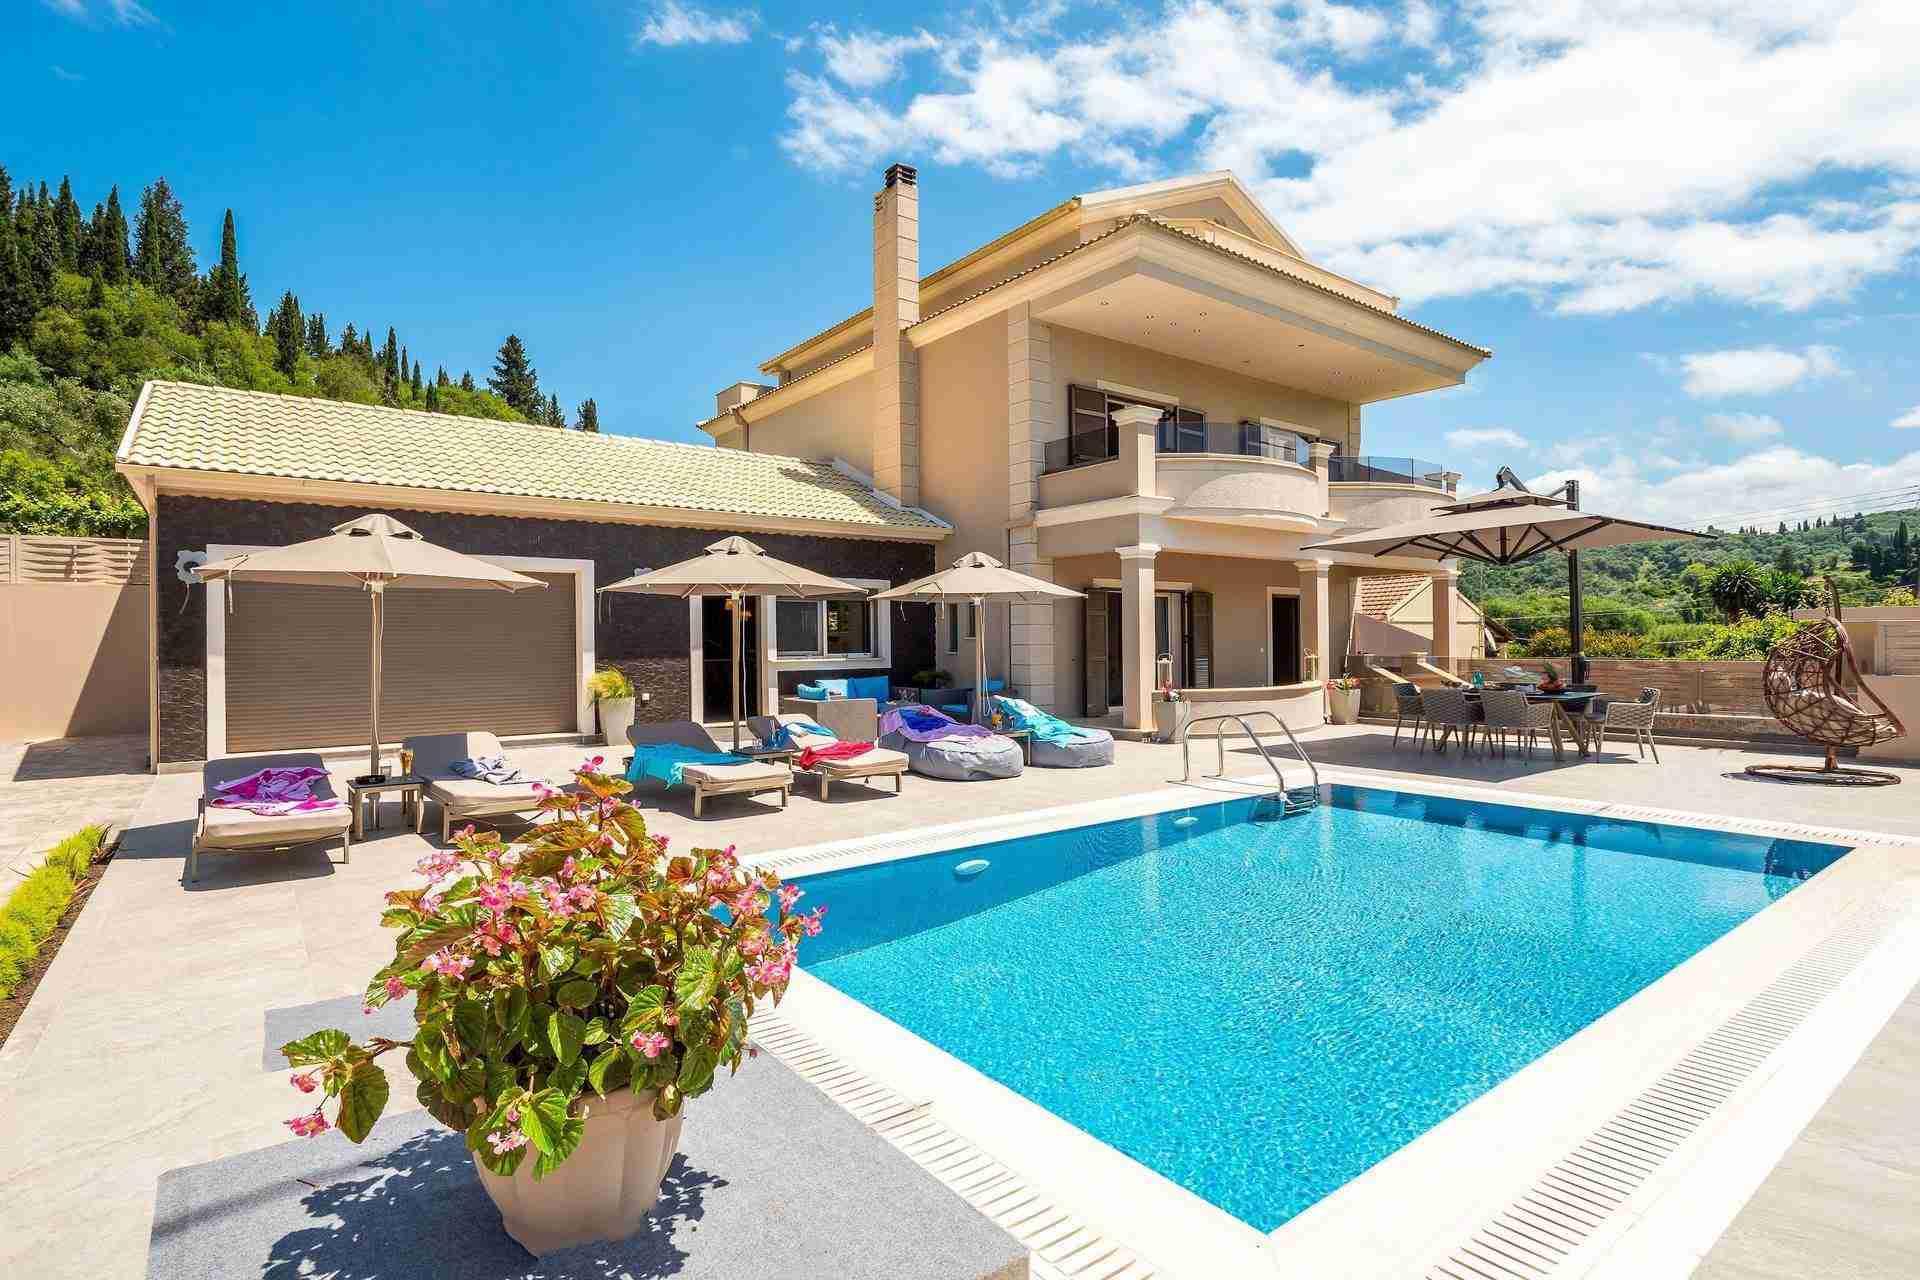 1 Petra pool